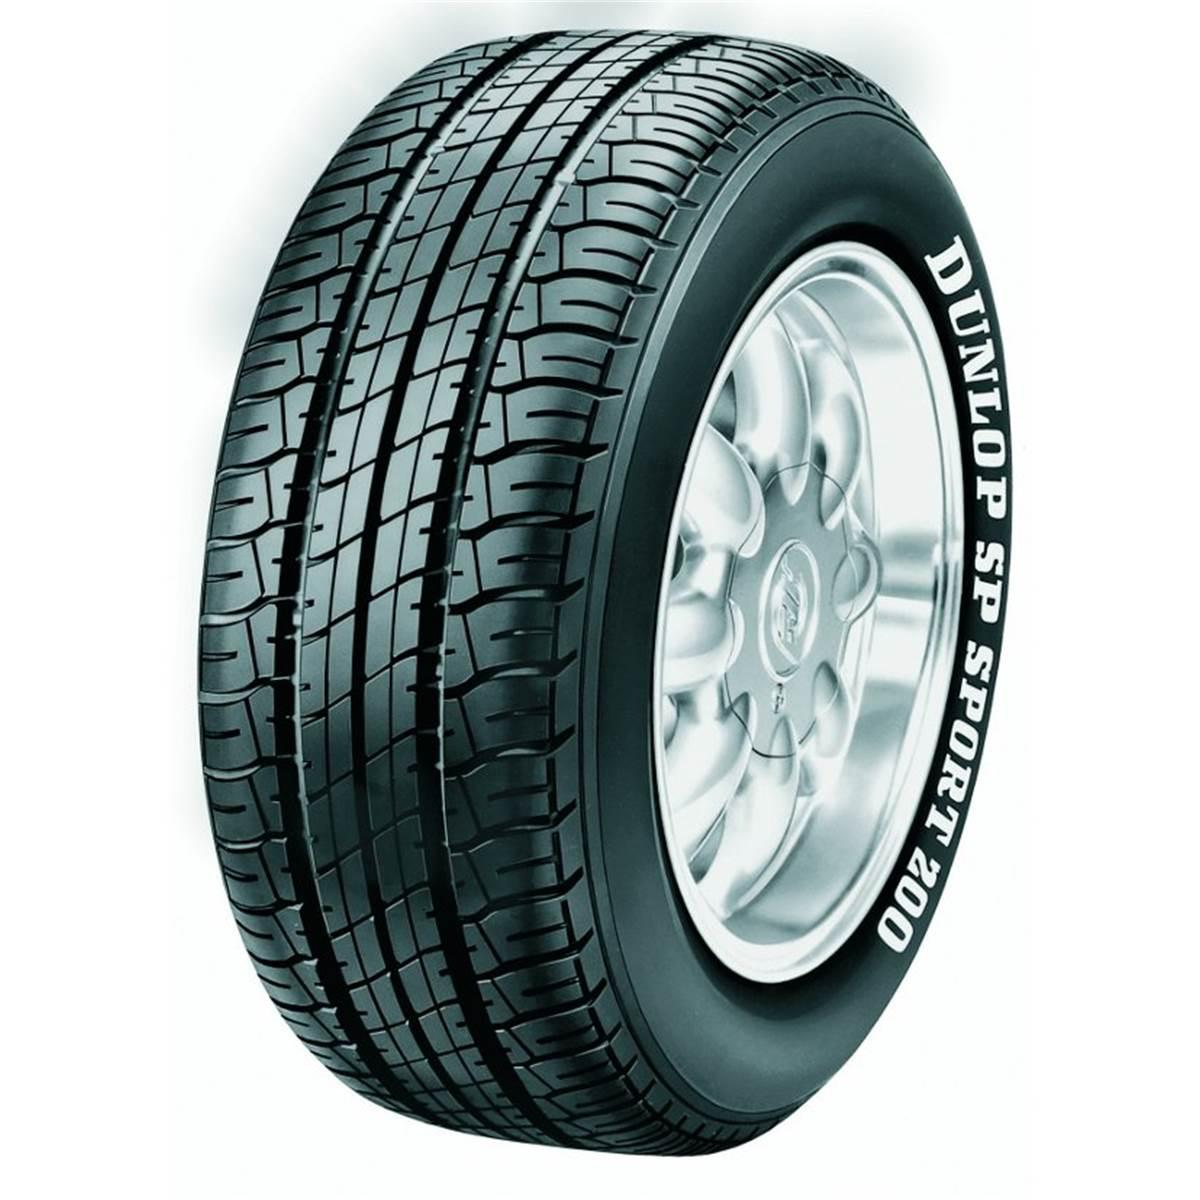 pneu dunlop sp sport 270 moins cher sur pneu pas cher. Black Bedroom Furniture Sets. Home Design Ideas